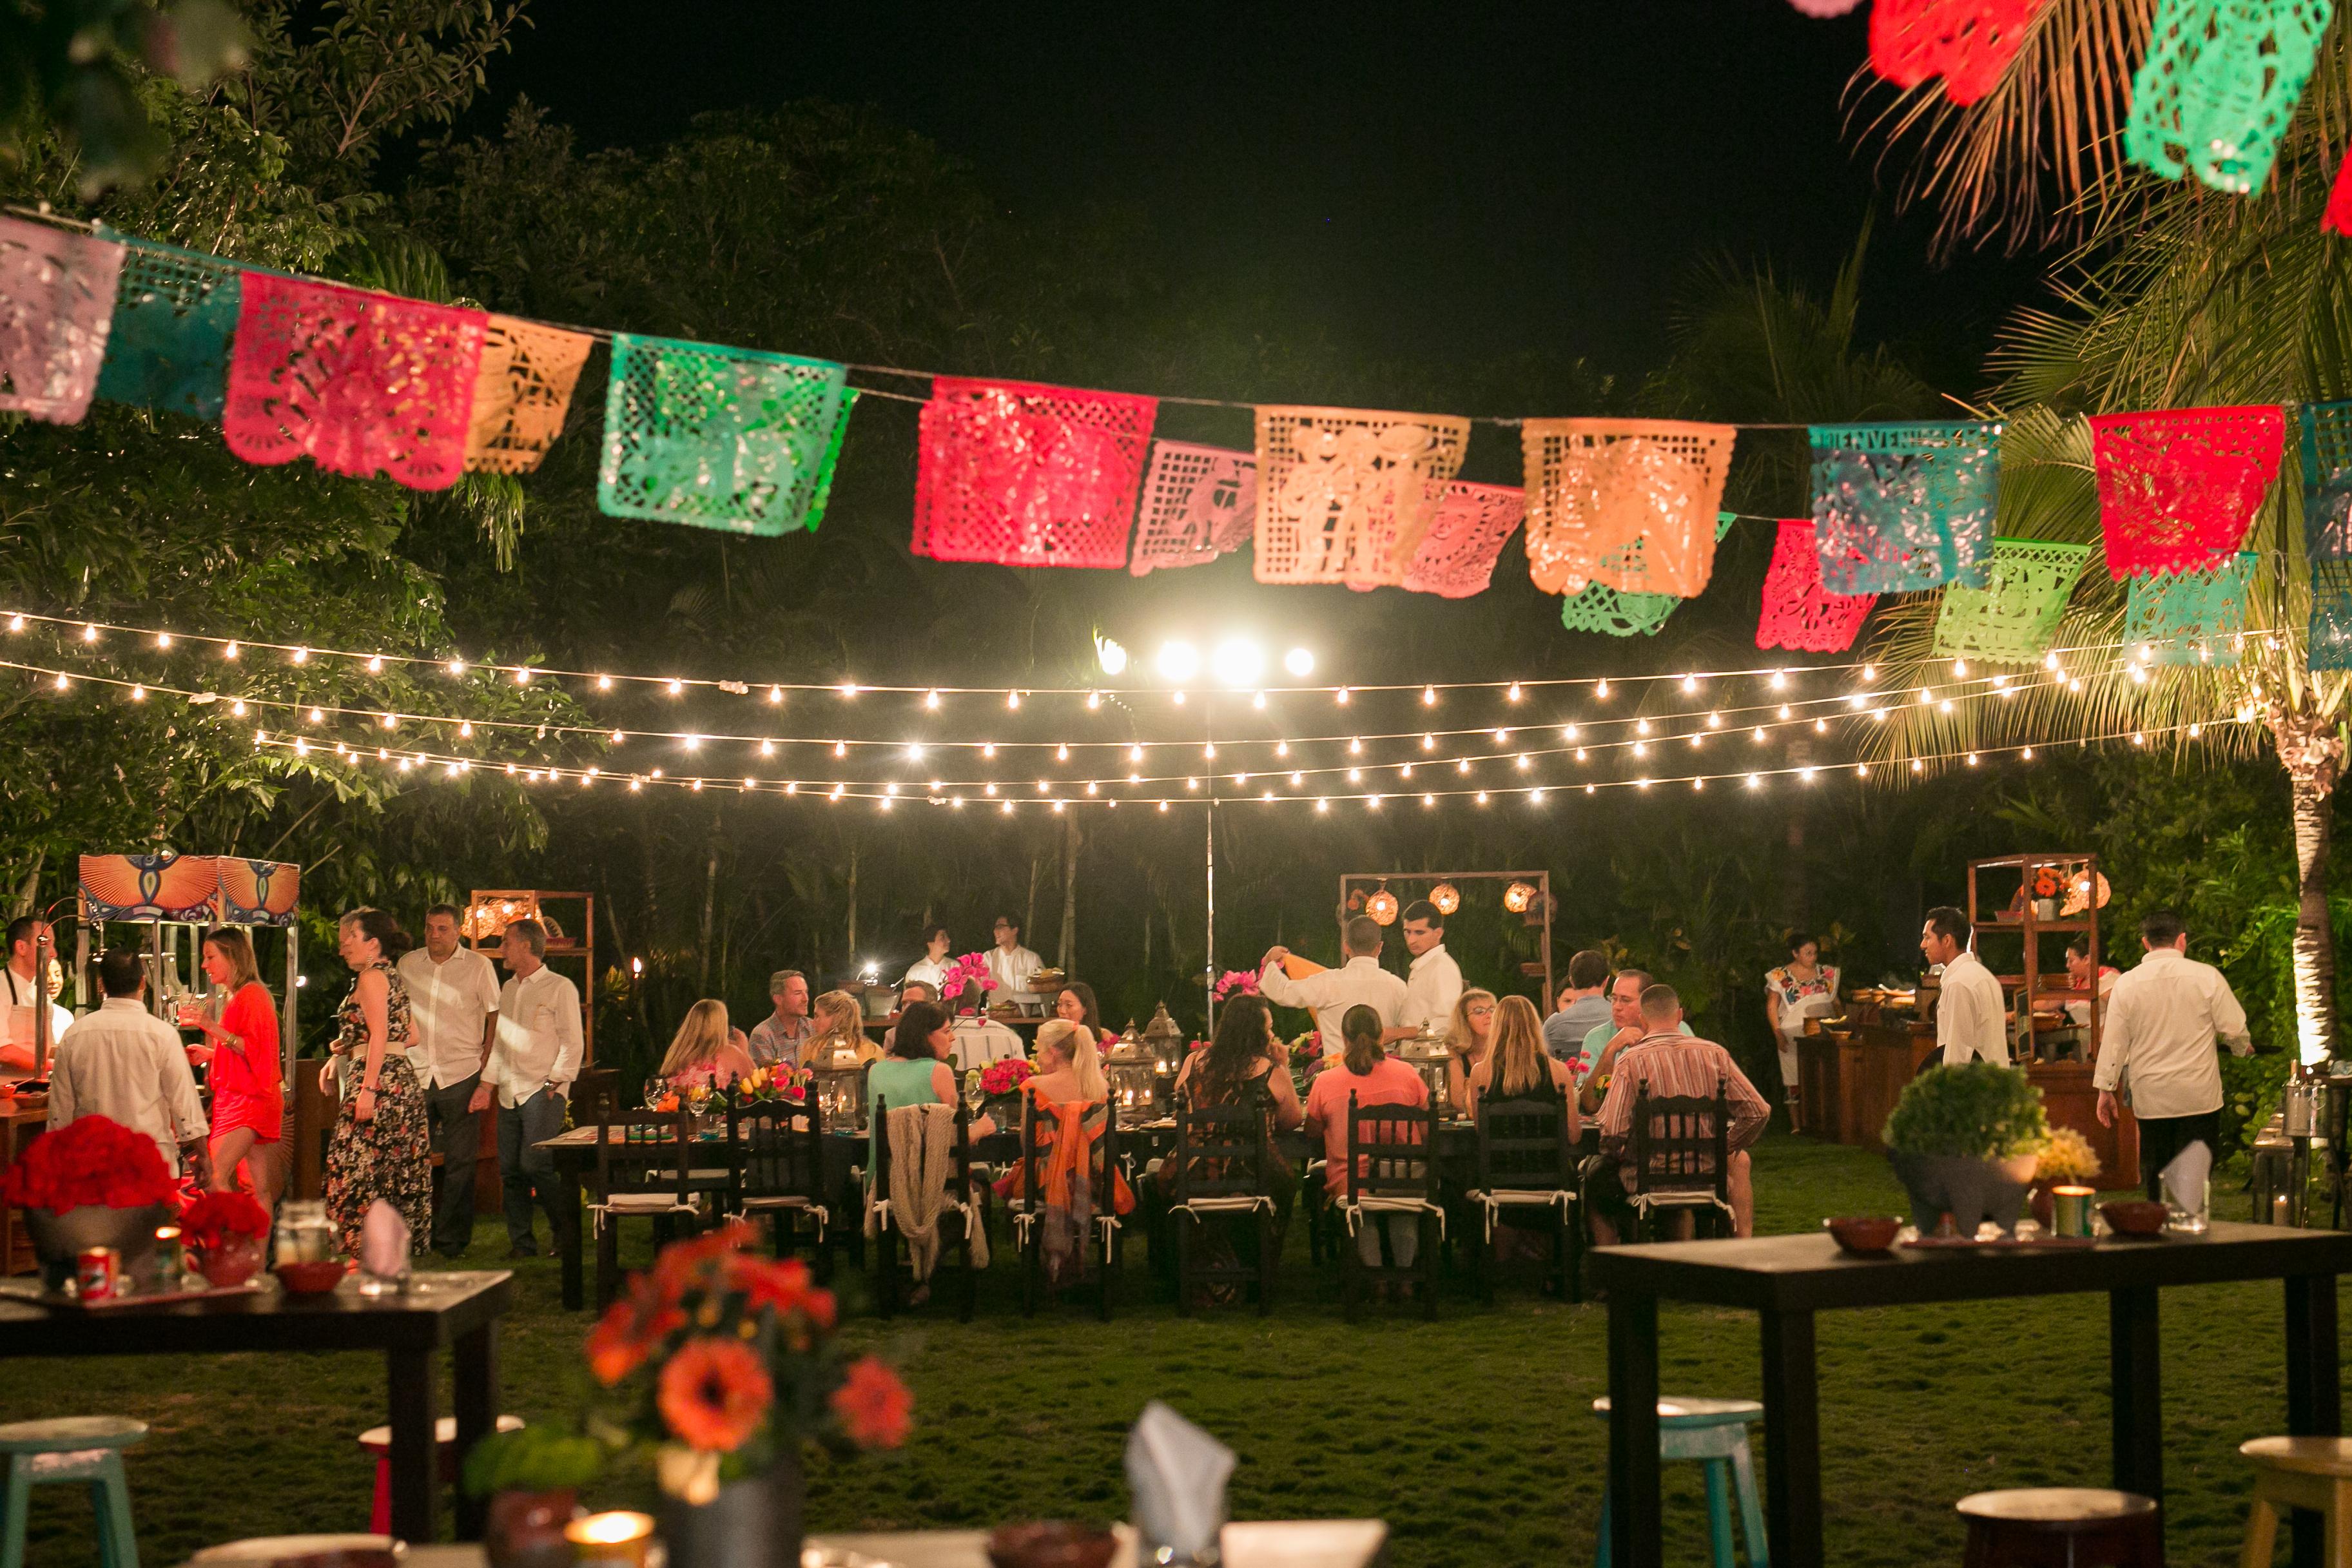 Riviera Maya Getaway: Mexican Welcome Fiesta - Elegant Occasions by JoAnn Gregoli